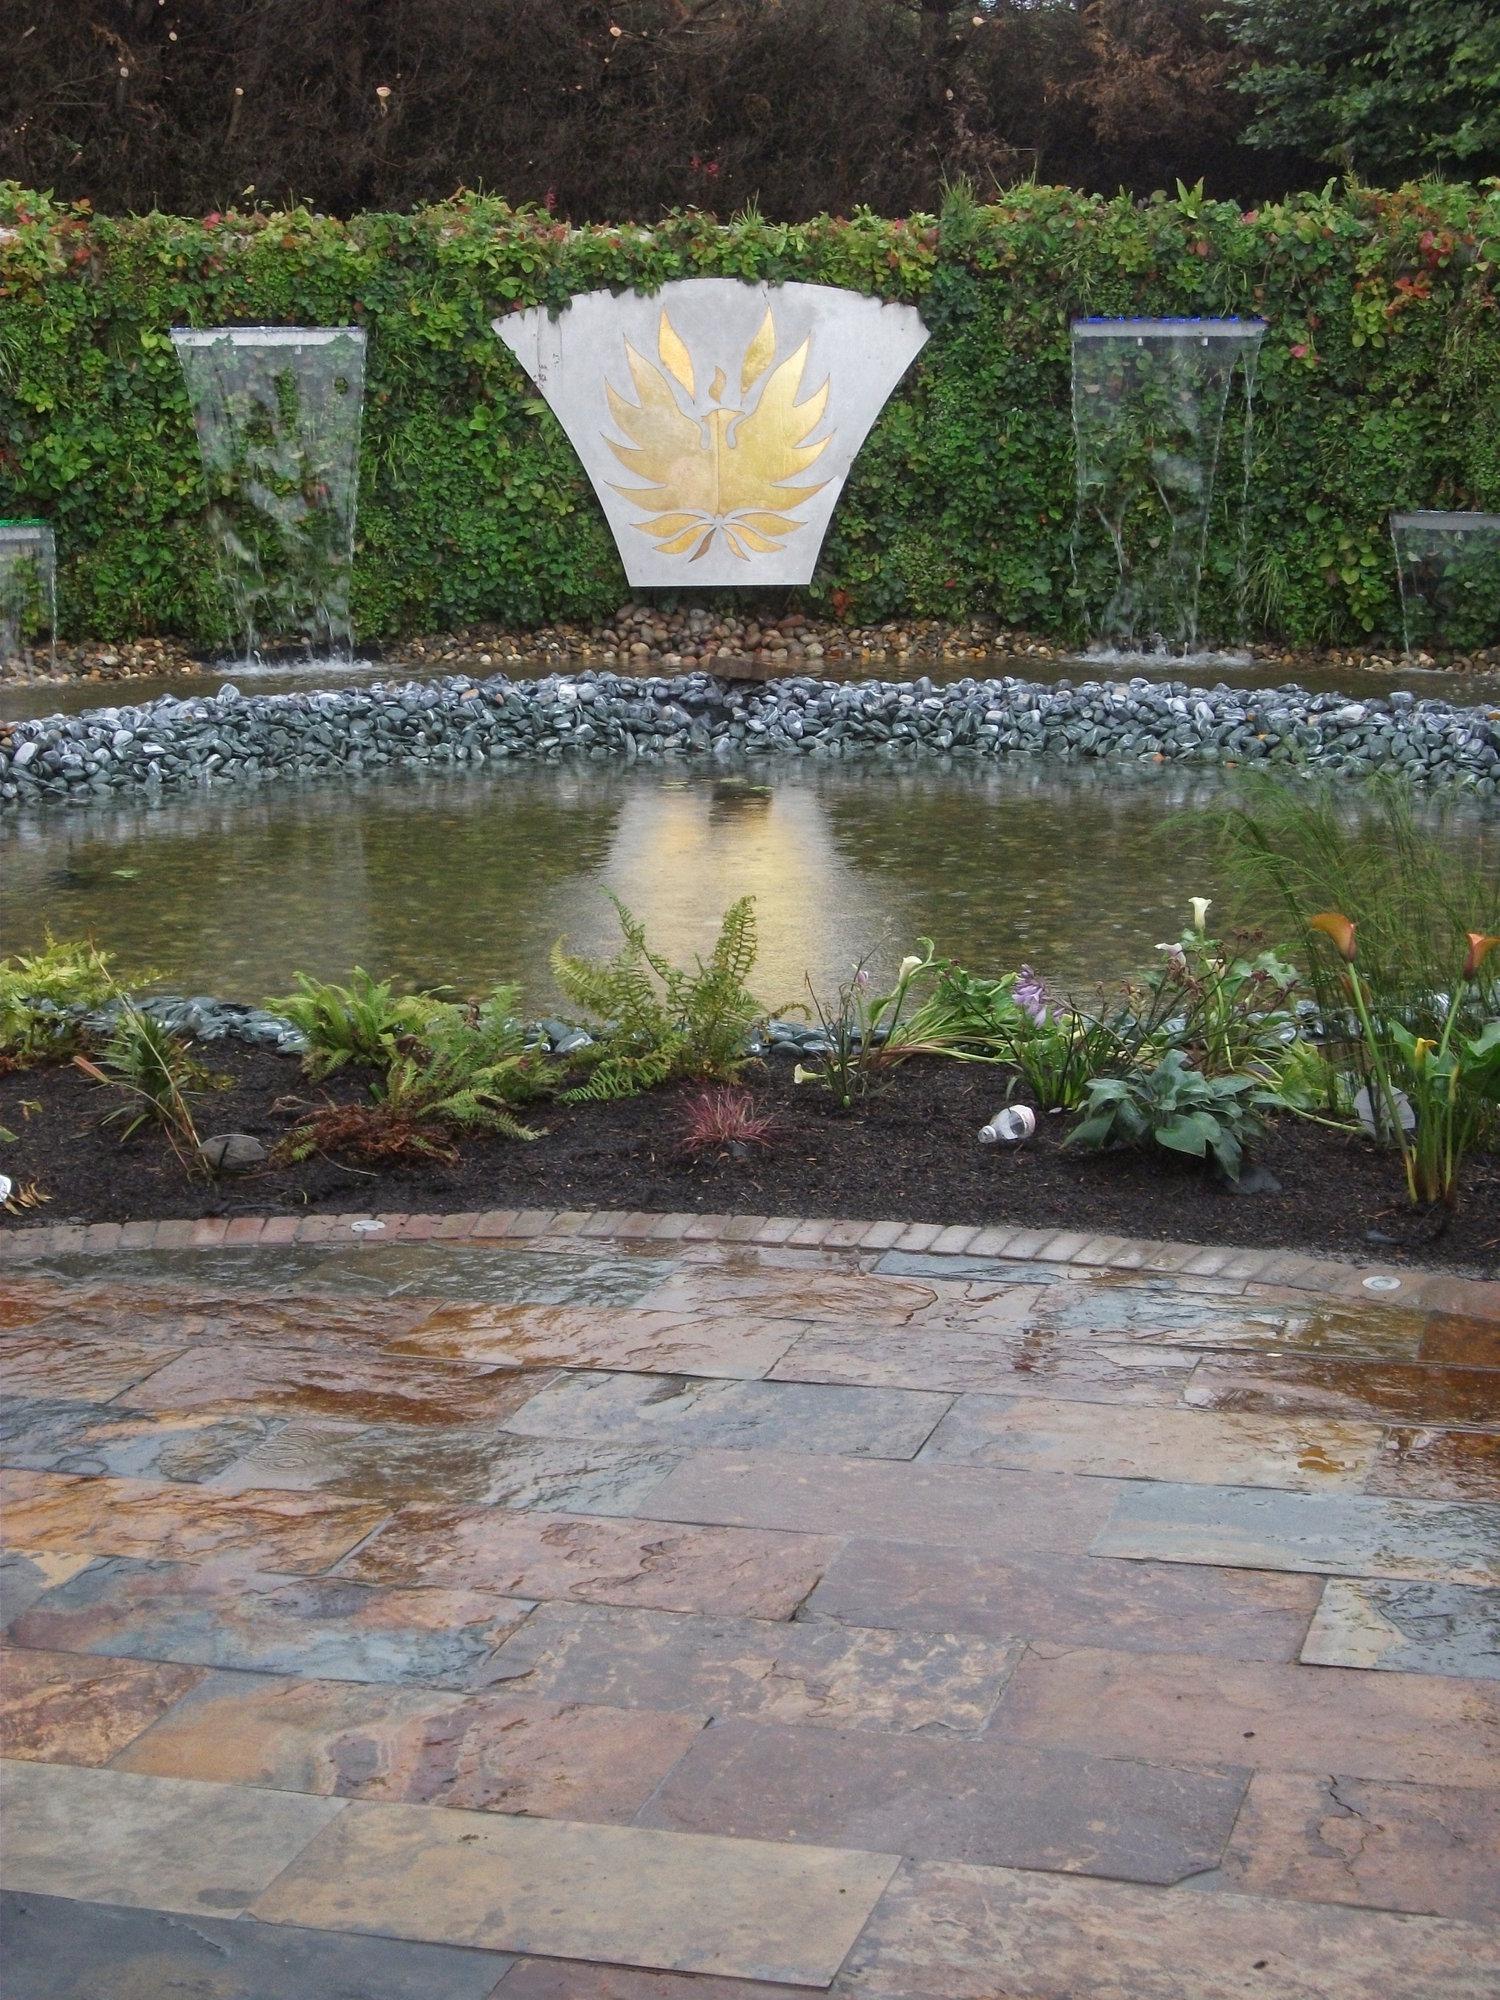 uk features for ideassmall feature small garden co satuska water ideas